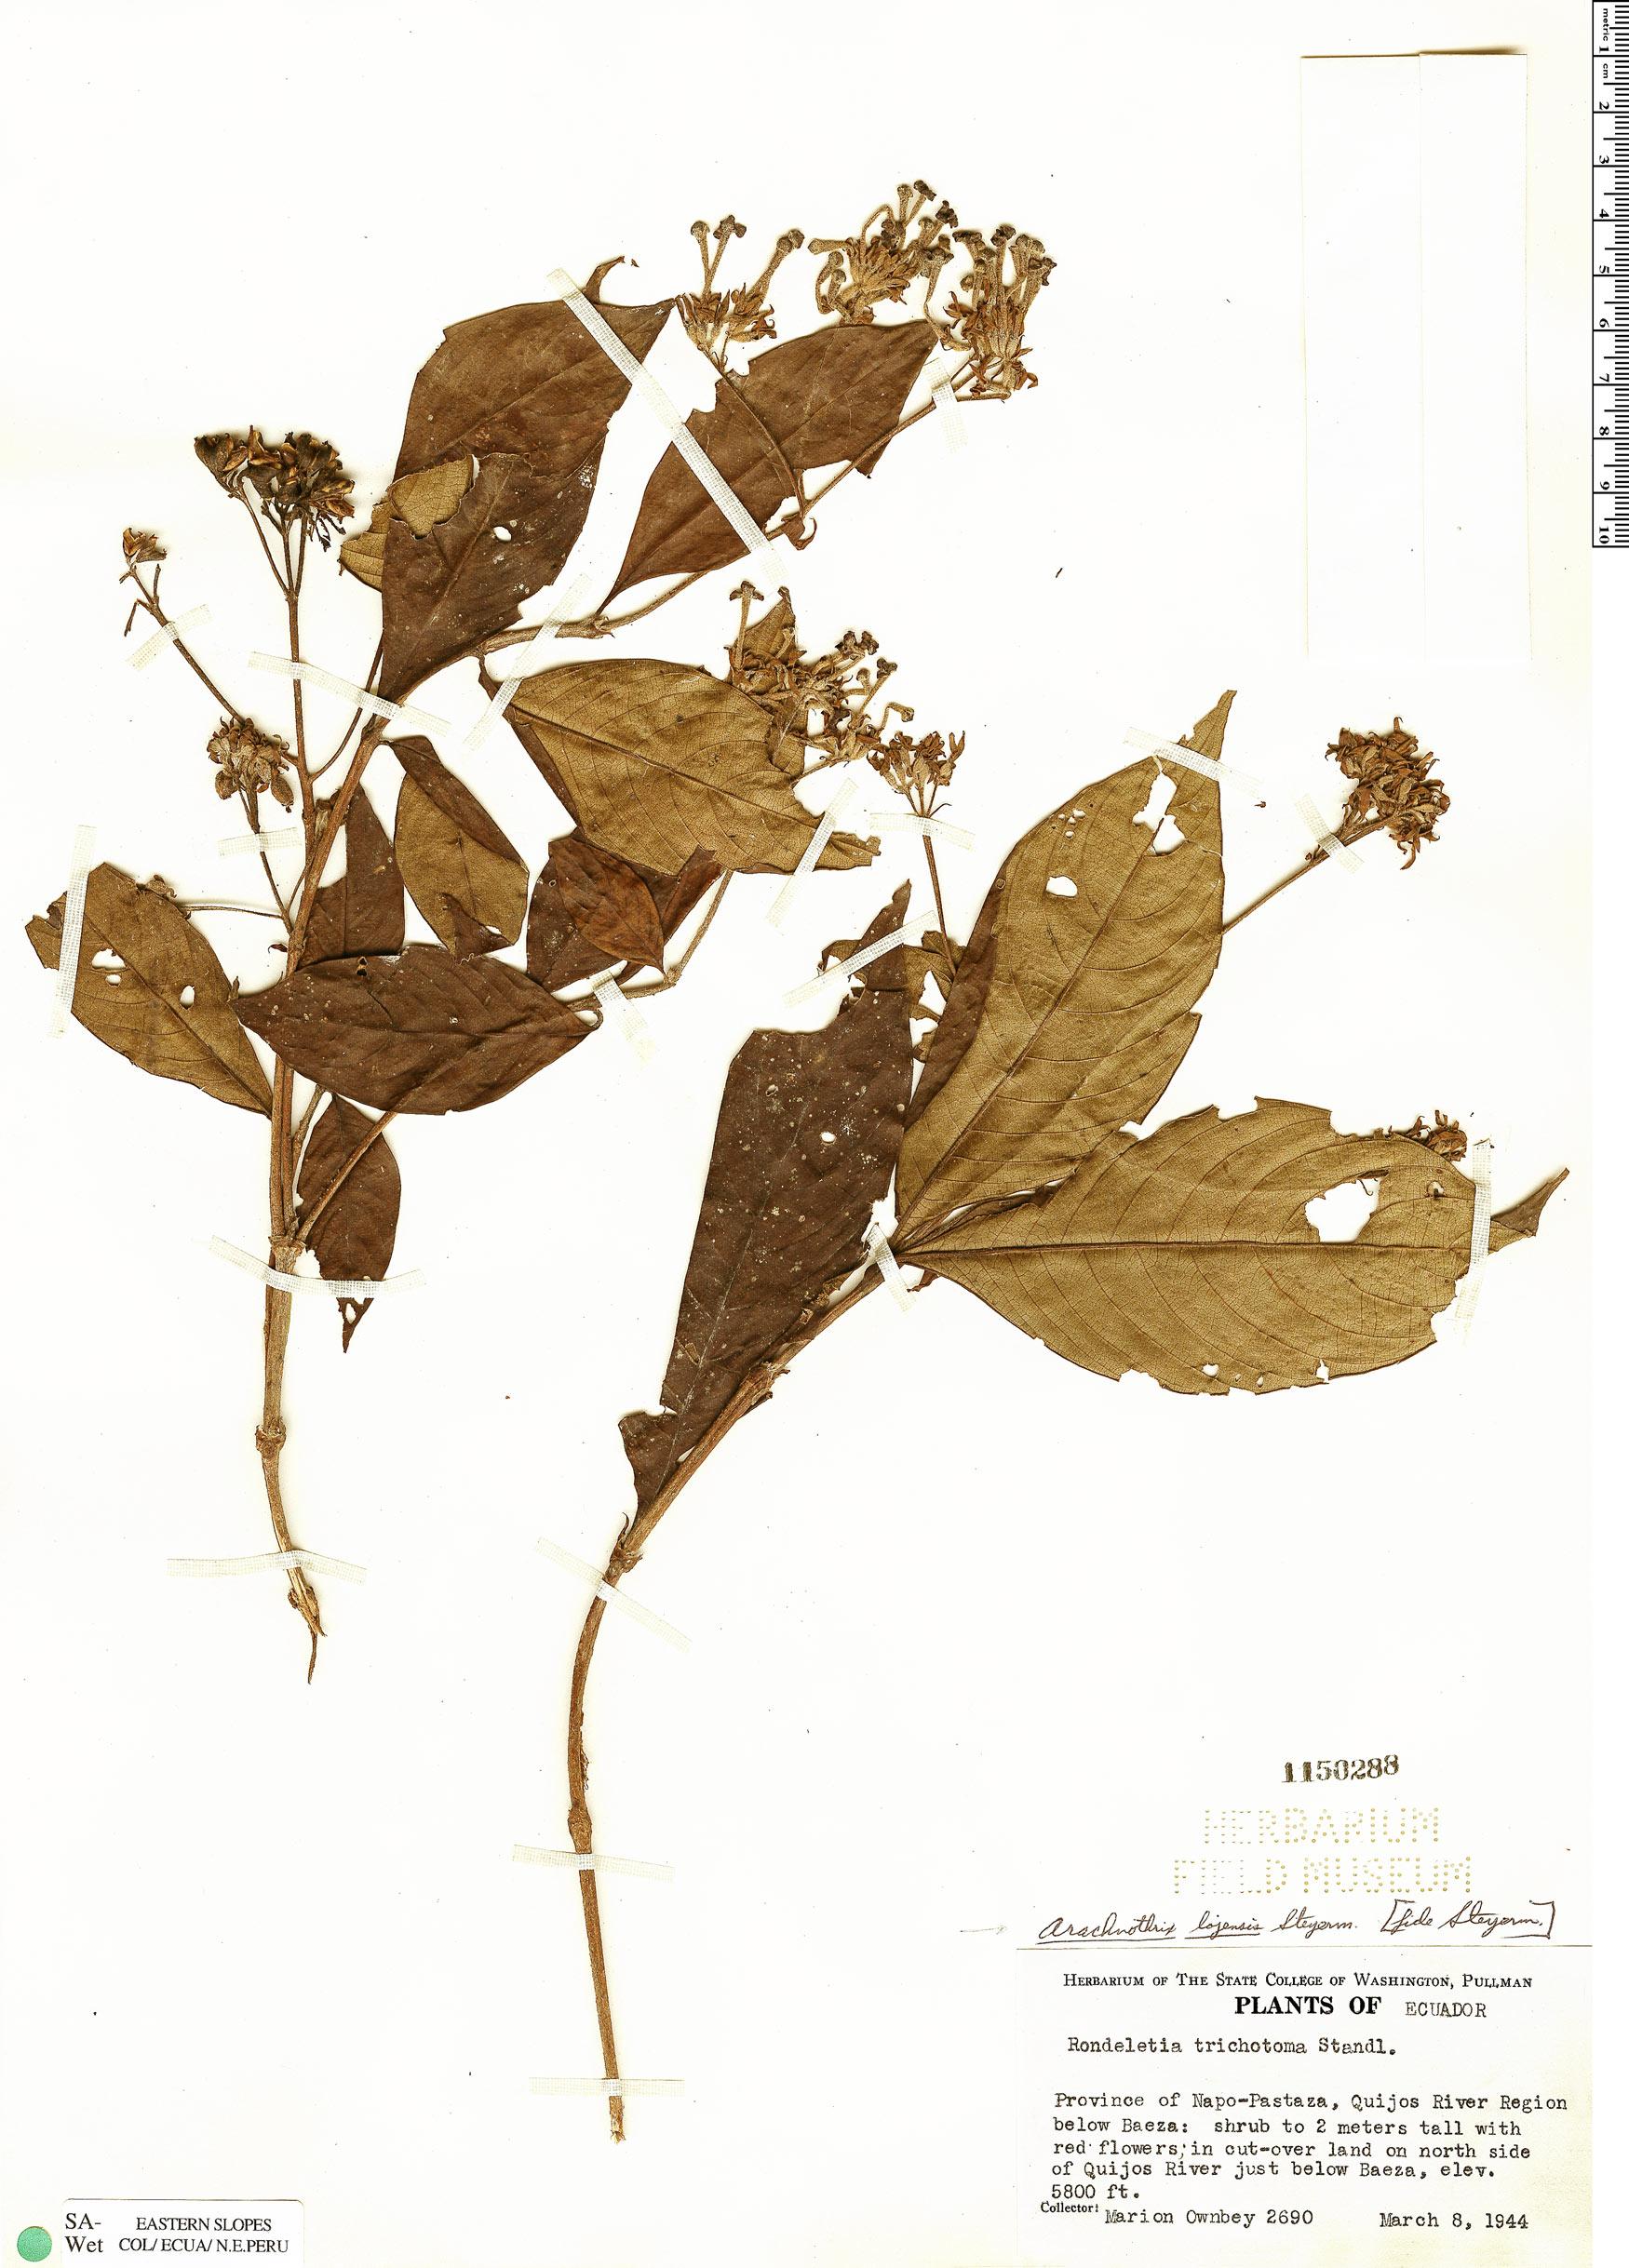 Specimen: Arachnothryx lojensis